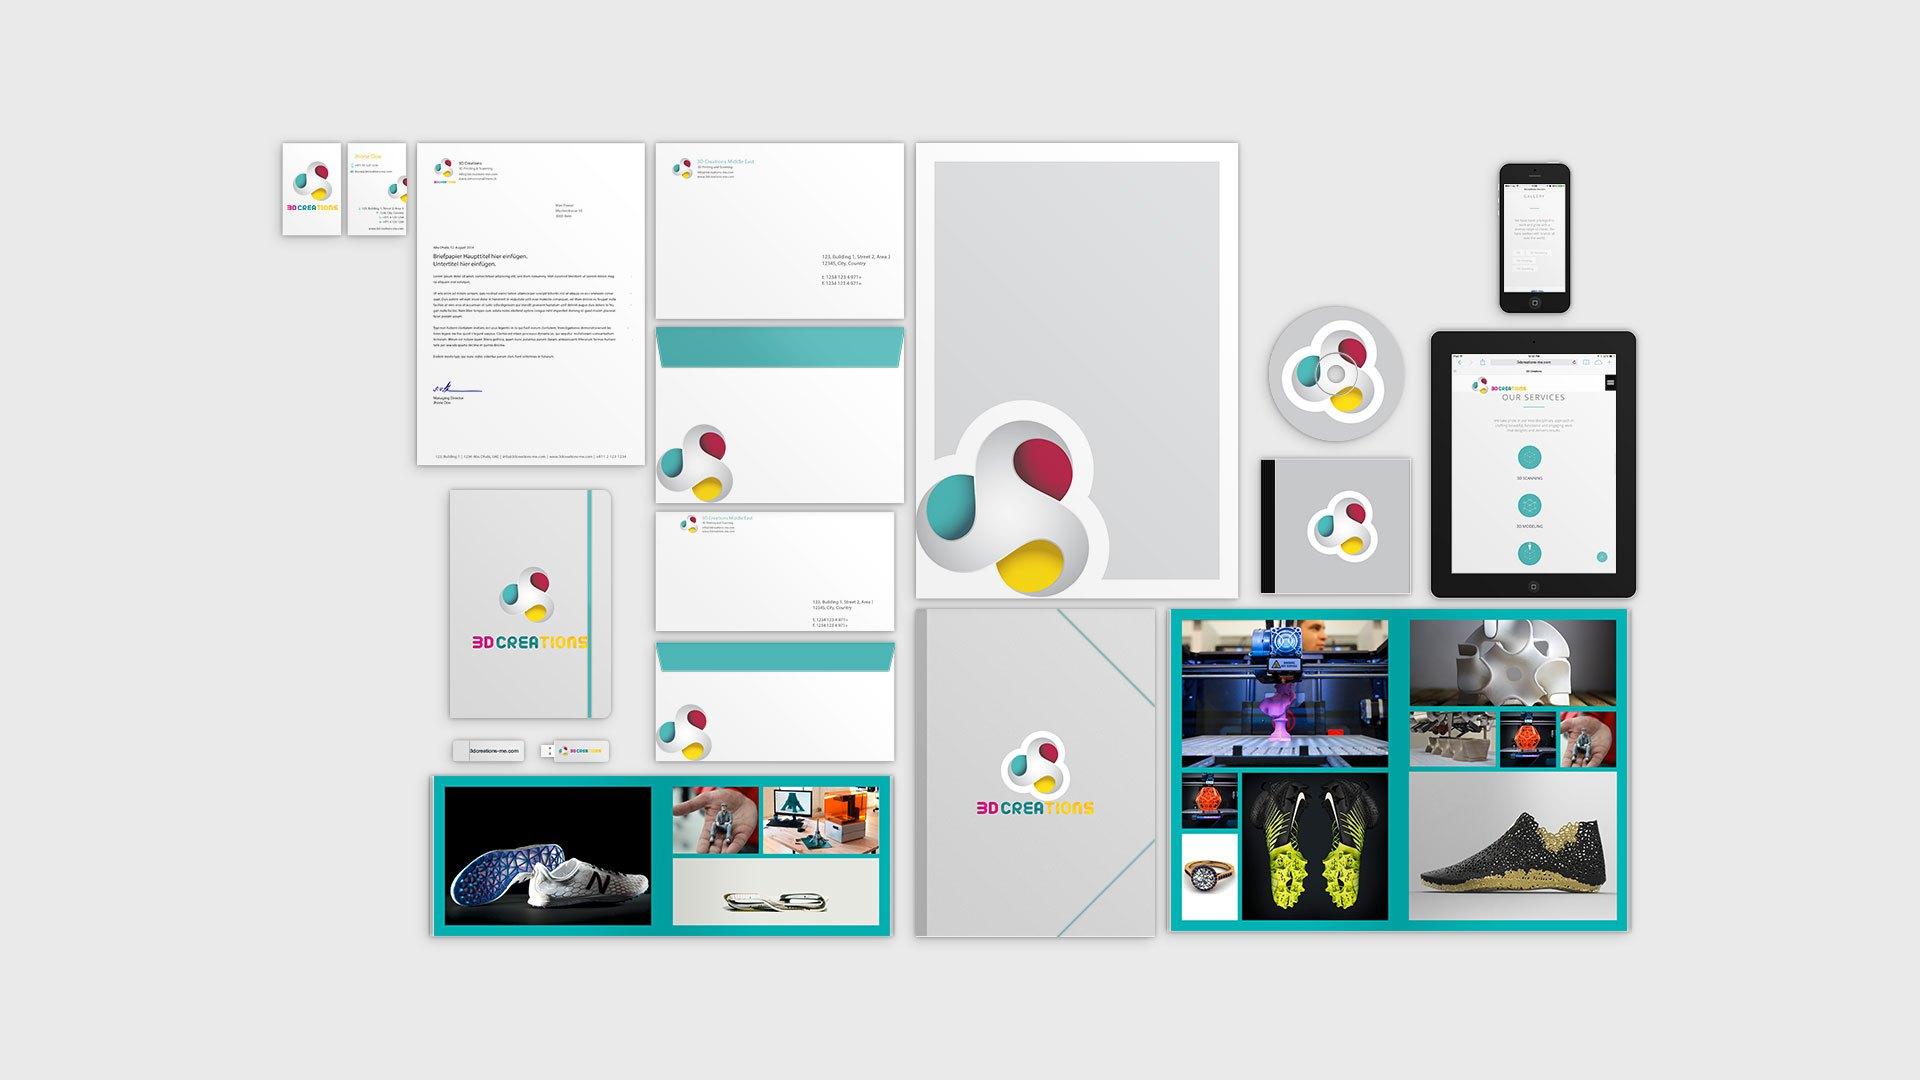 3d-creations-branding